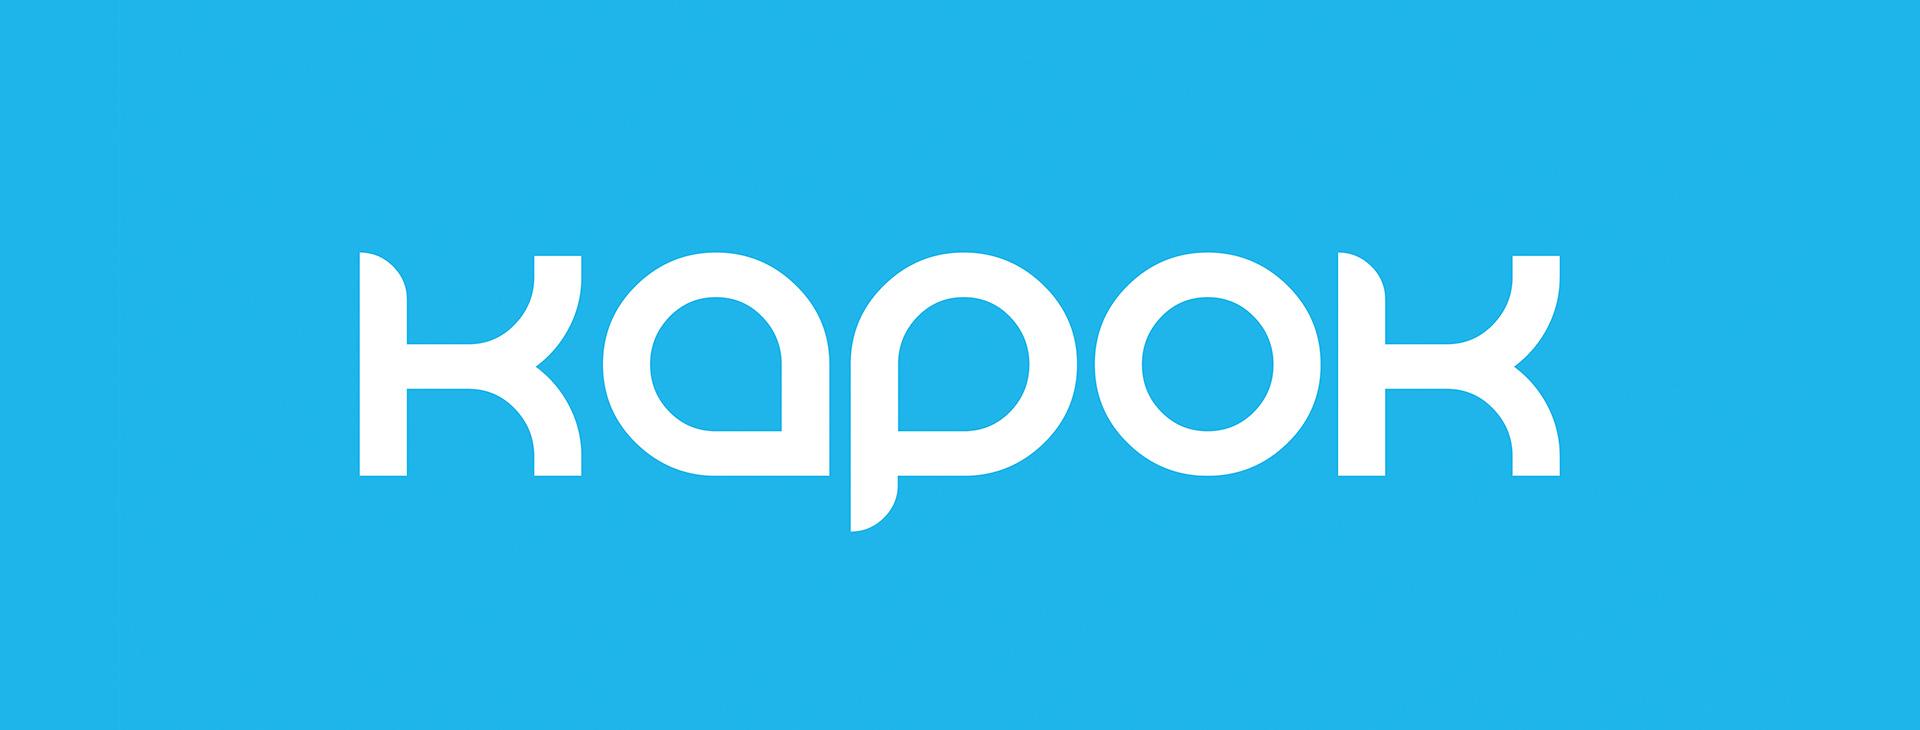 kapok_lente_NO_20201102